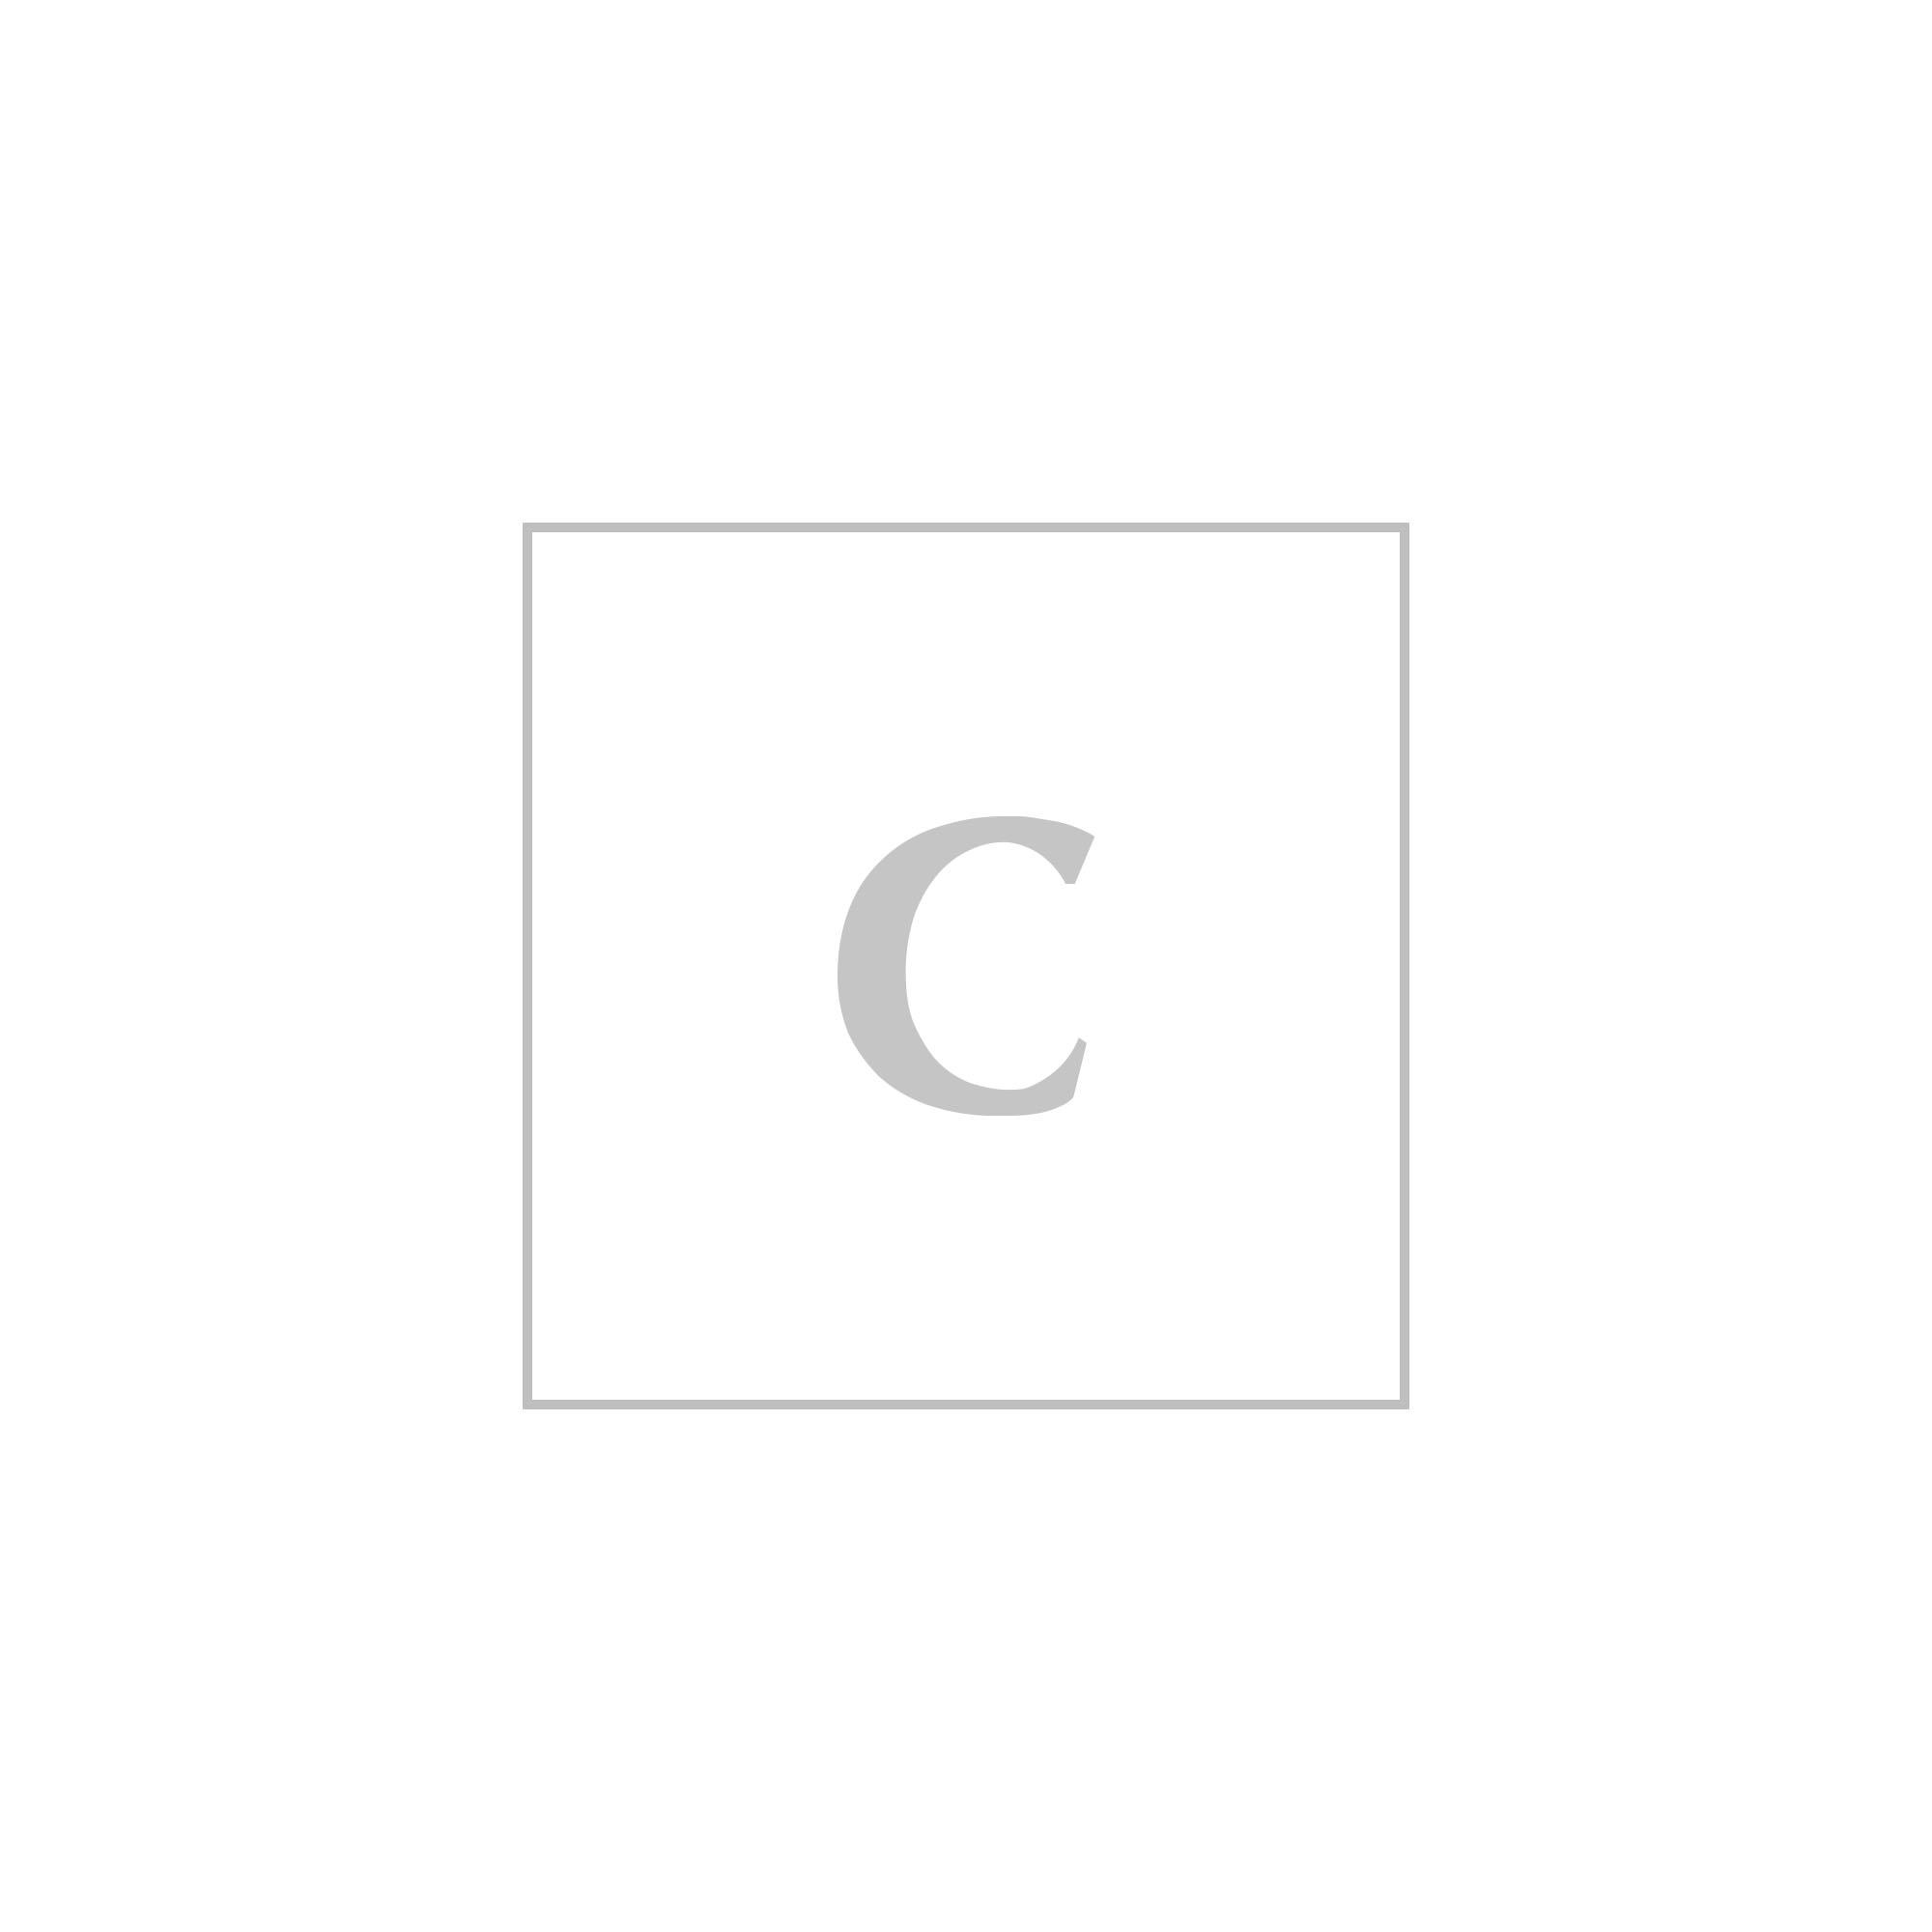 Saint laurent ysl monogram cardholder